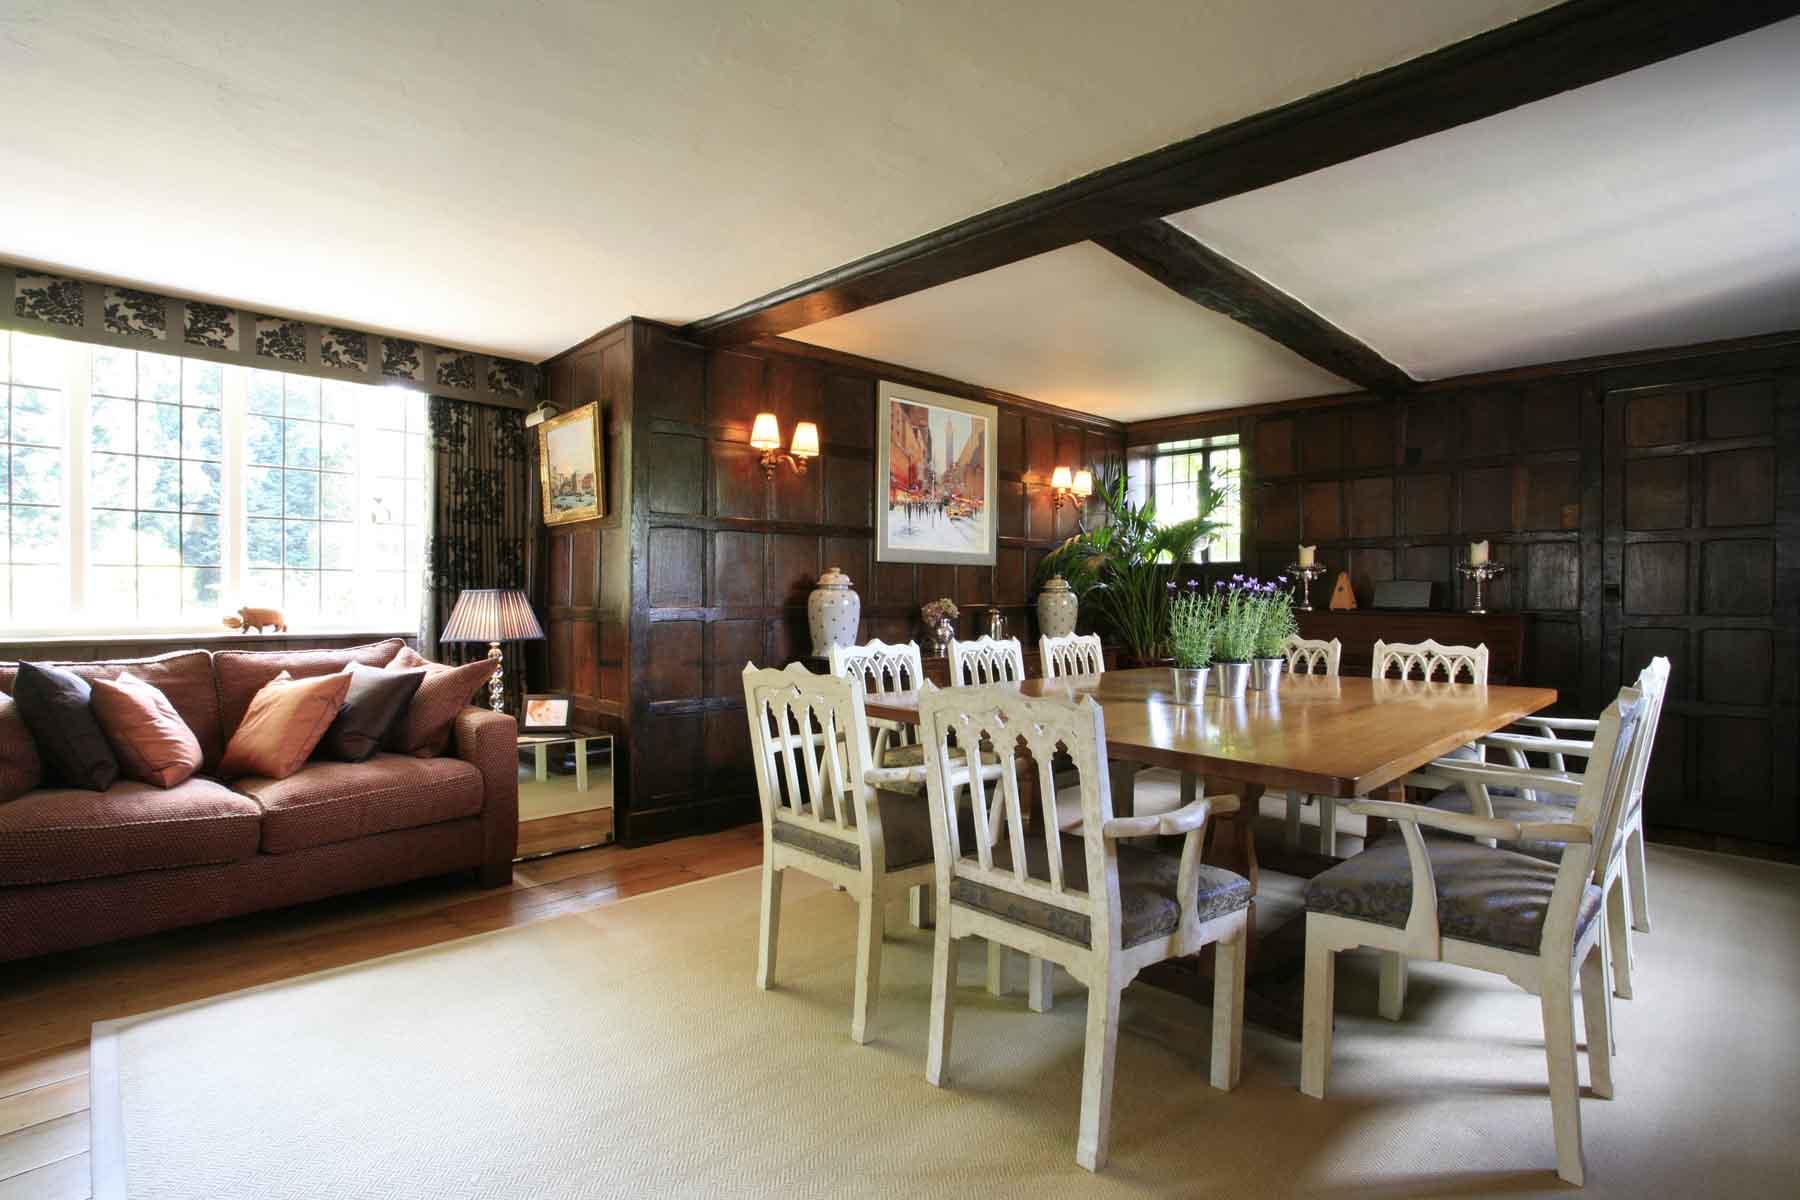 Carol_Fulton_Photography_traditional_interiors__004.jpg